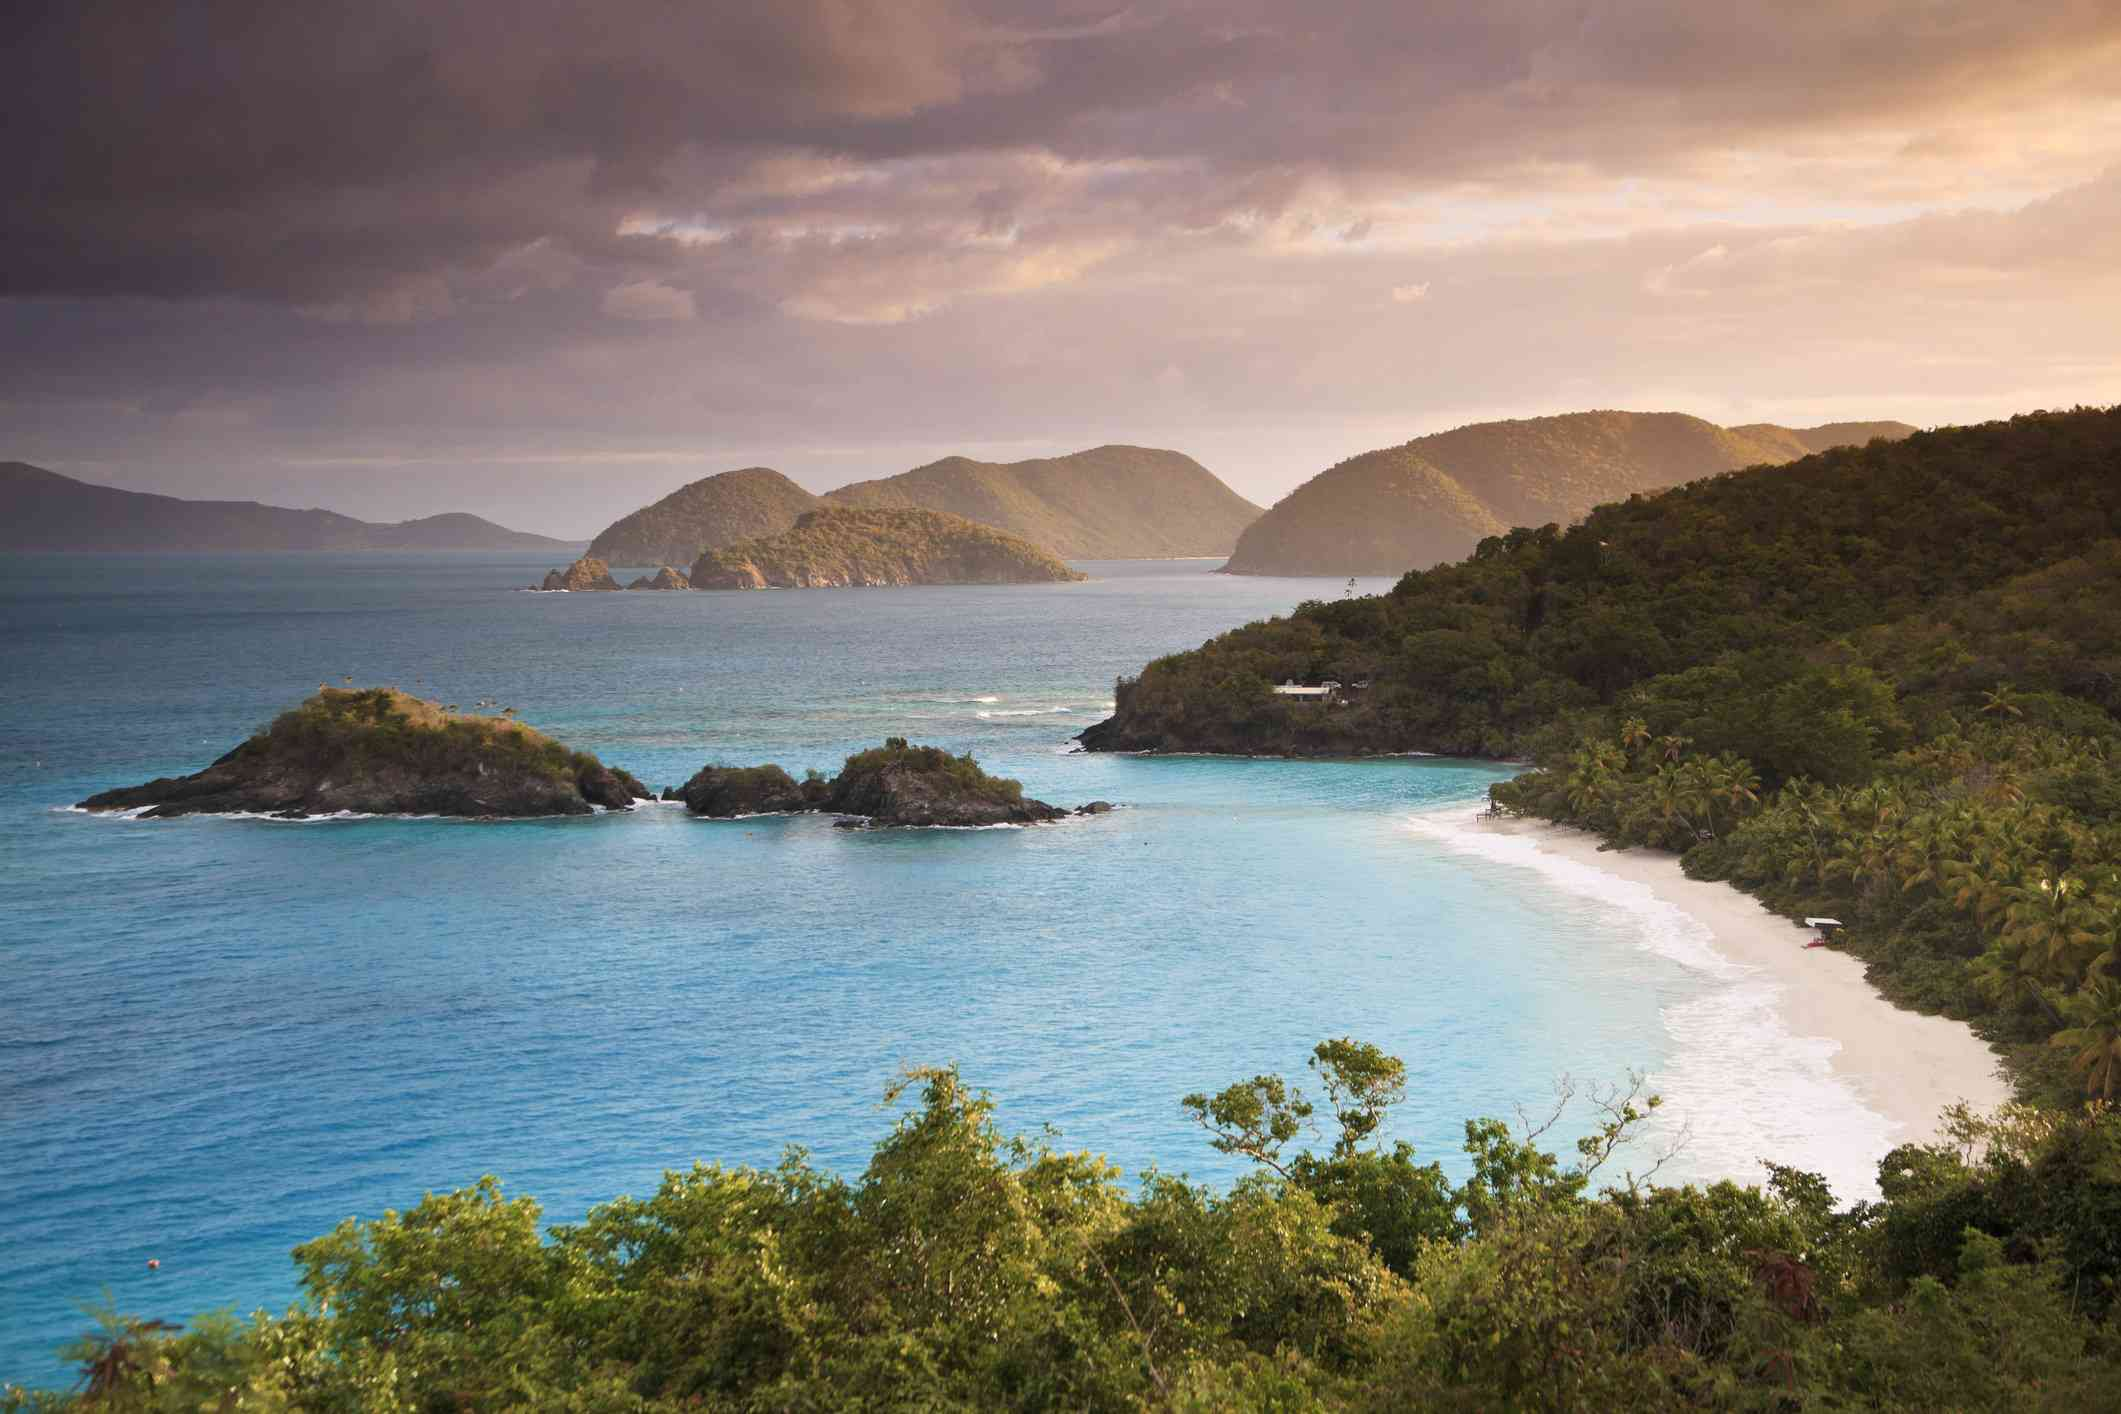 Caribbean, US Virgin Islands, Virgin Islands, St. John, National Park, Trunk Bay